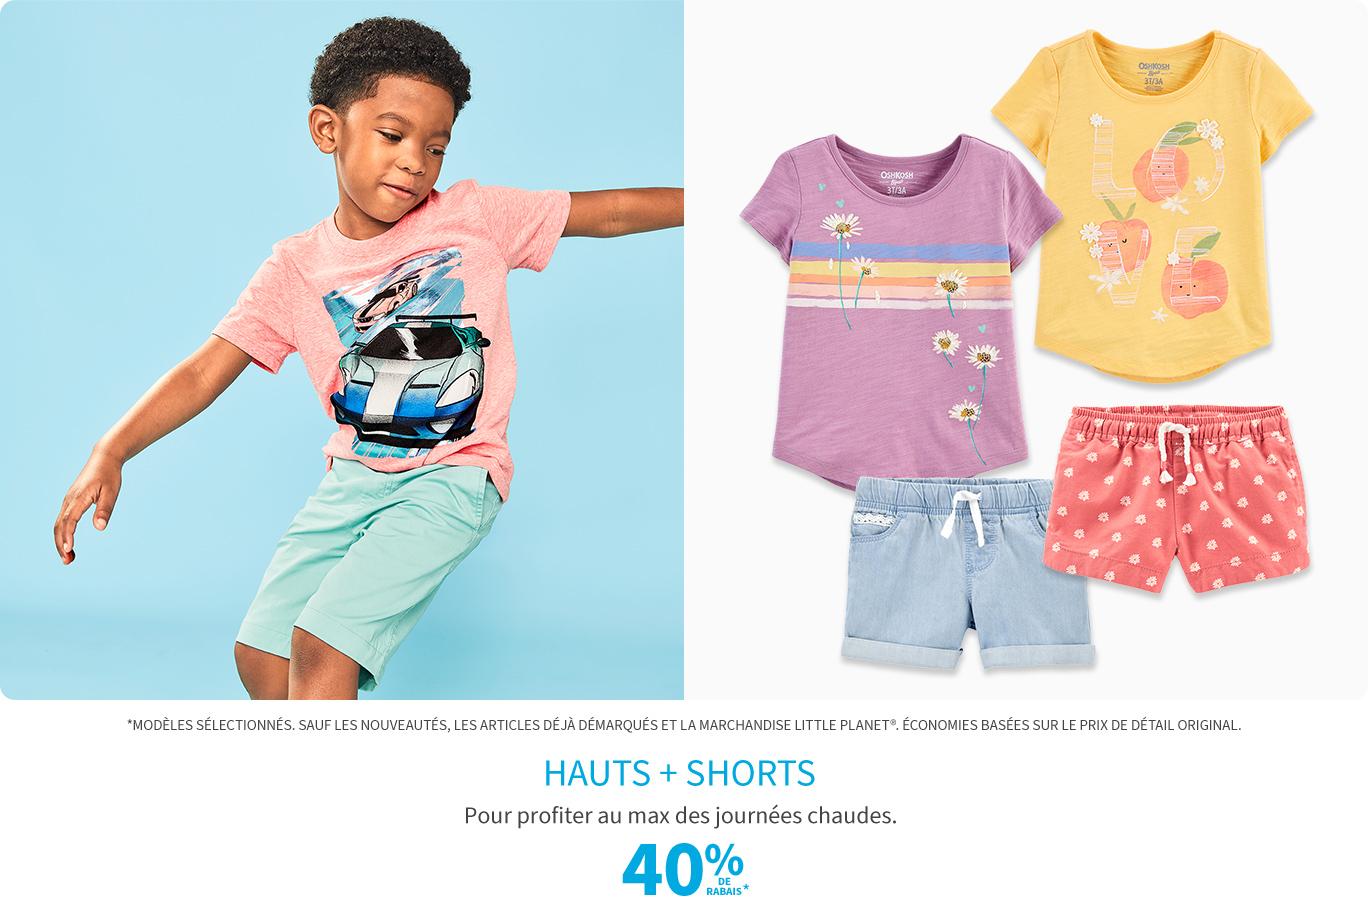 Hauts + Shorts 40% de rabais*